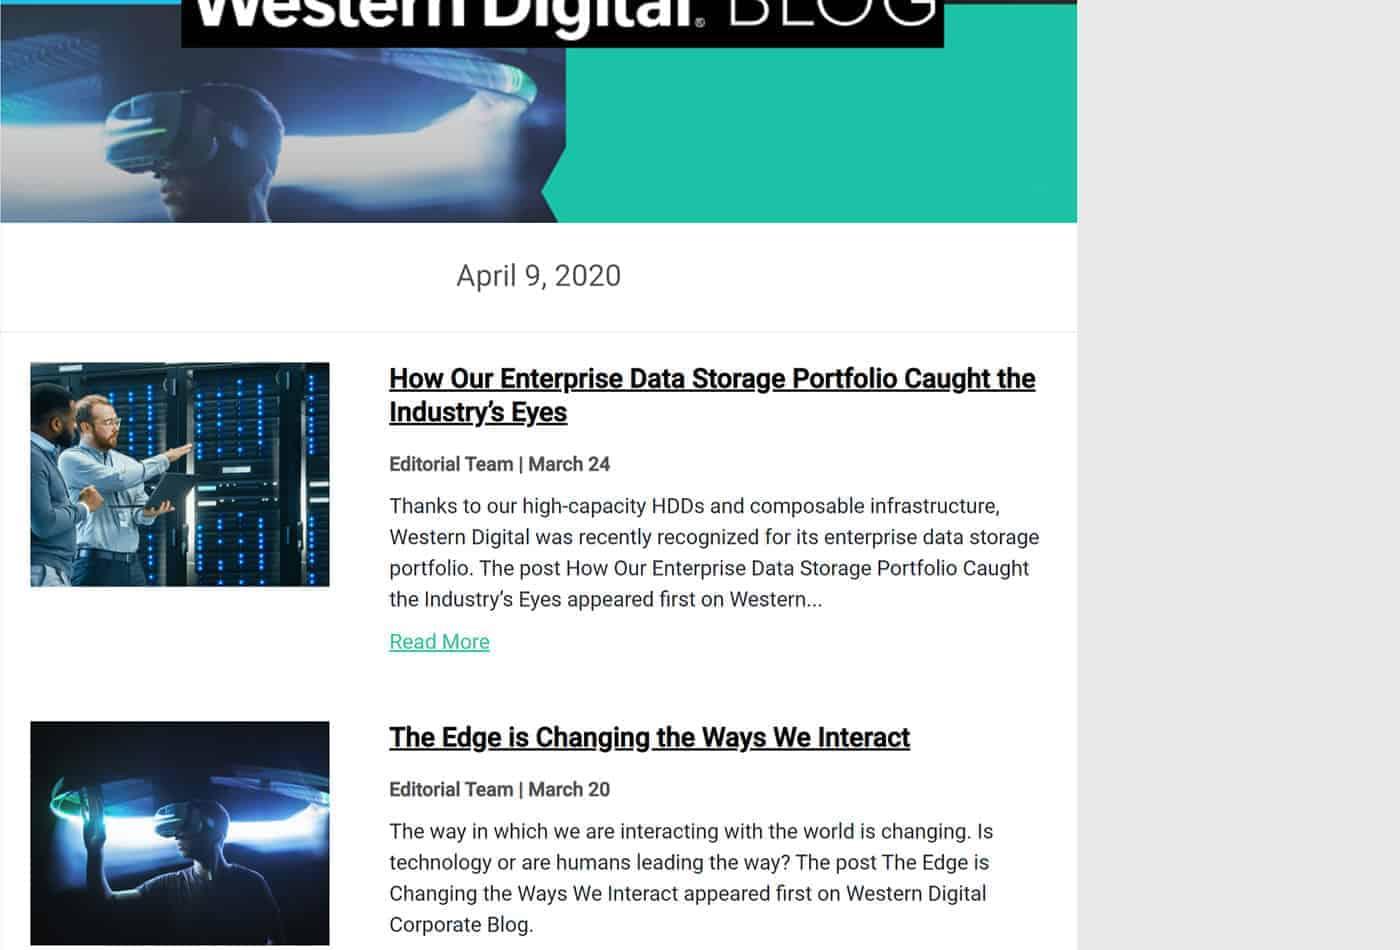 Western Digital's Marketo Blog Digest